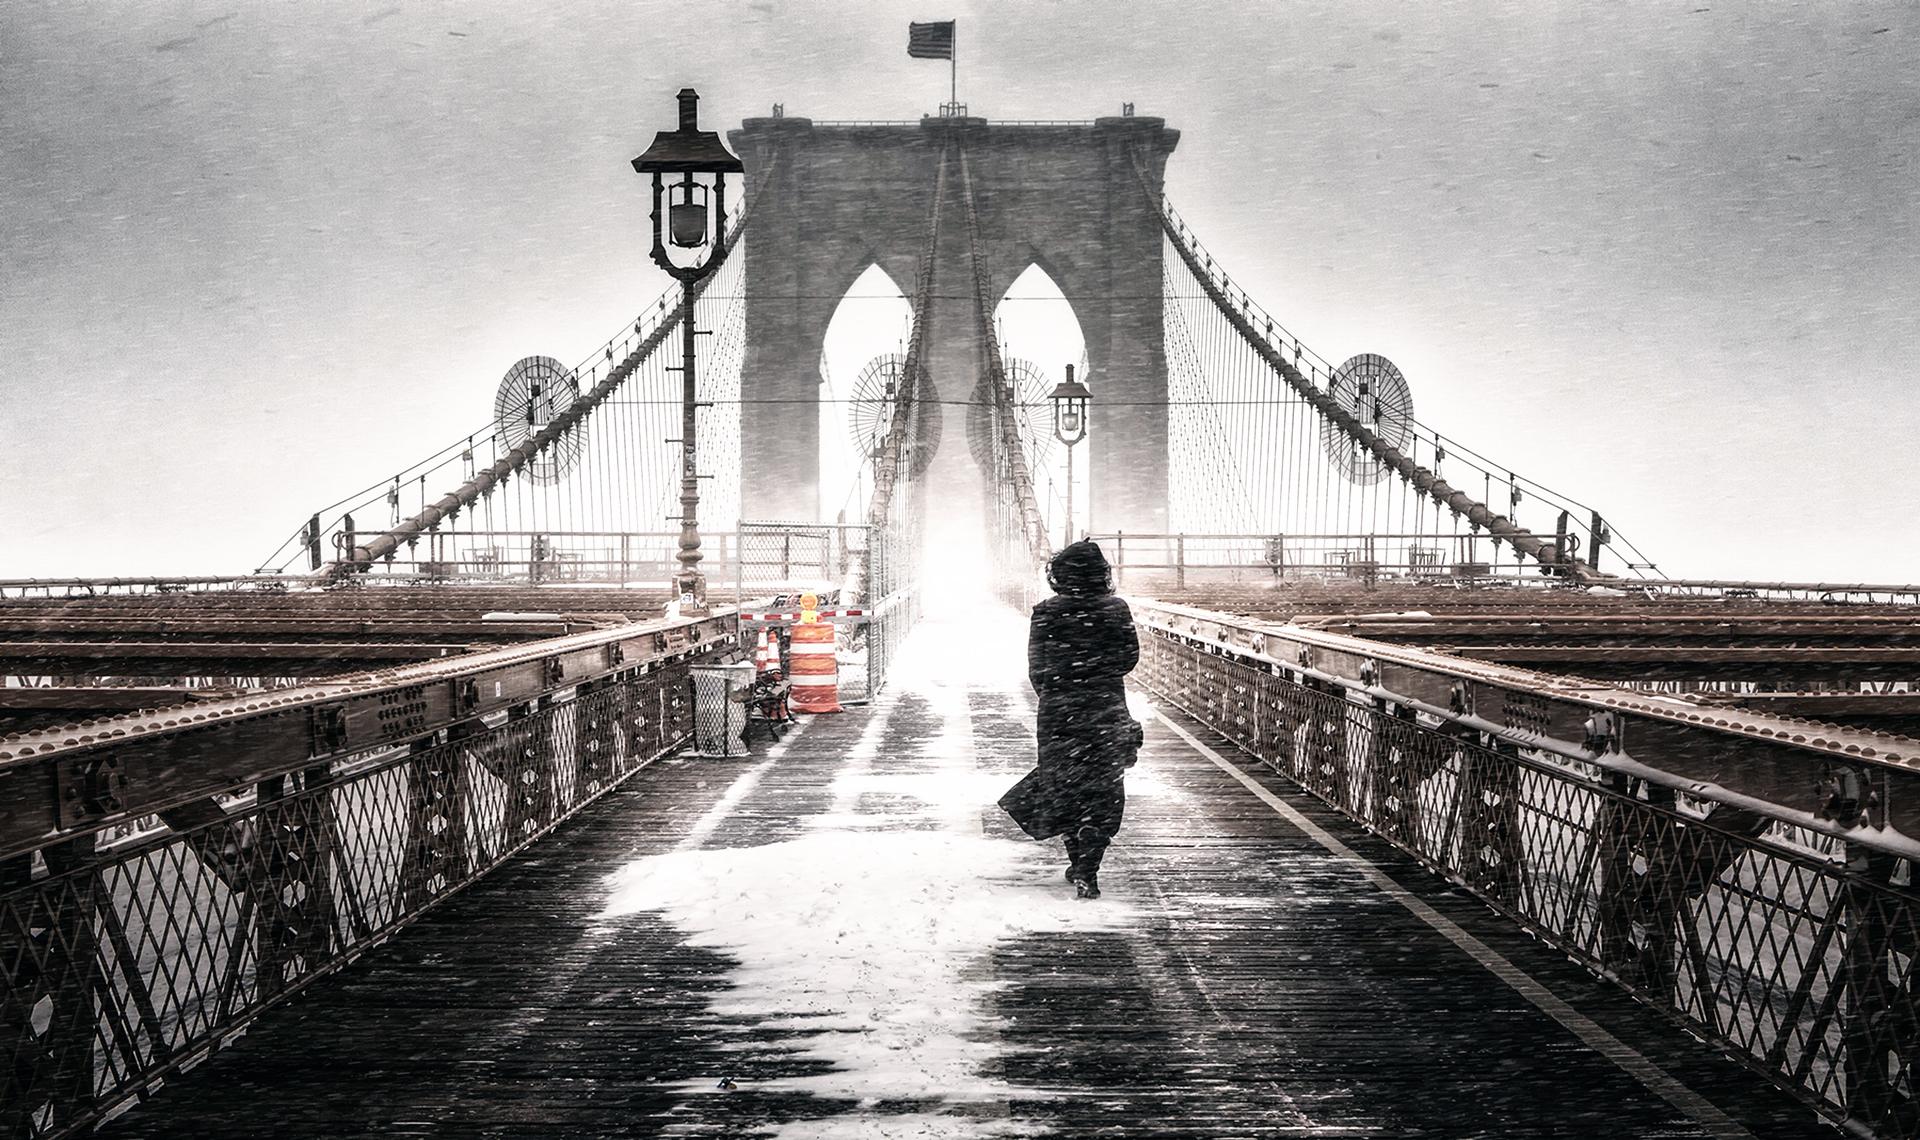 Картинки свидания, открытка на мосту